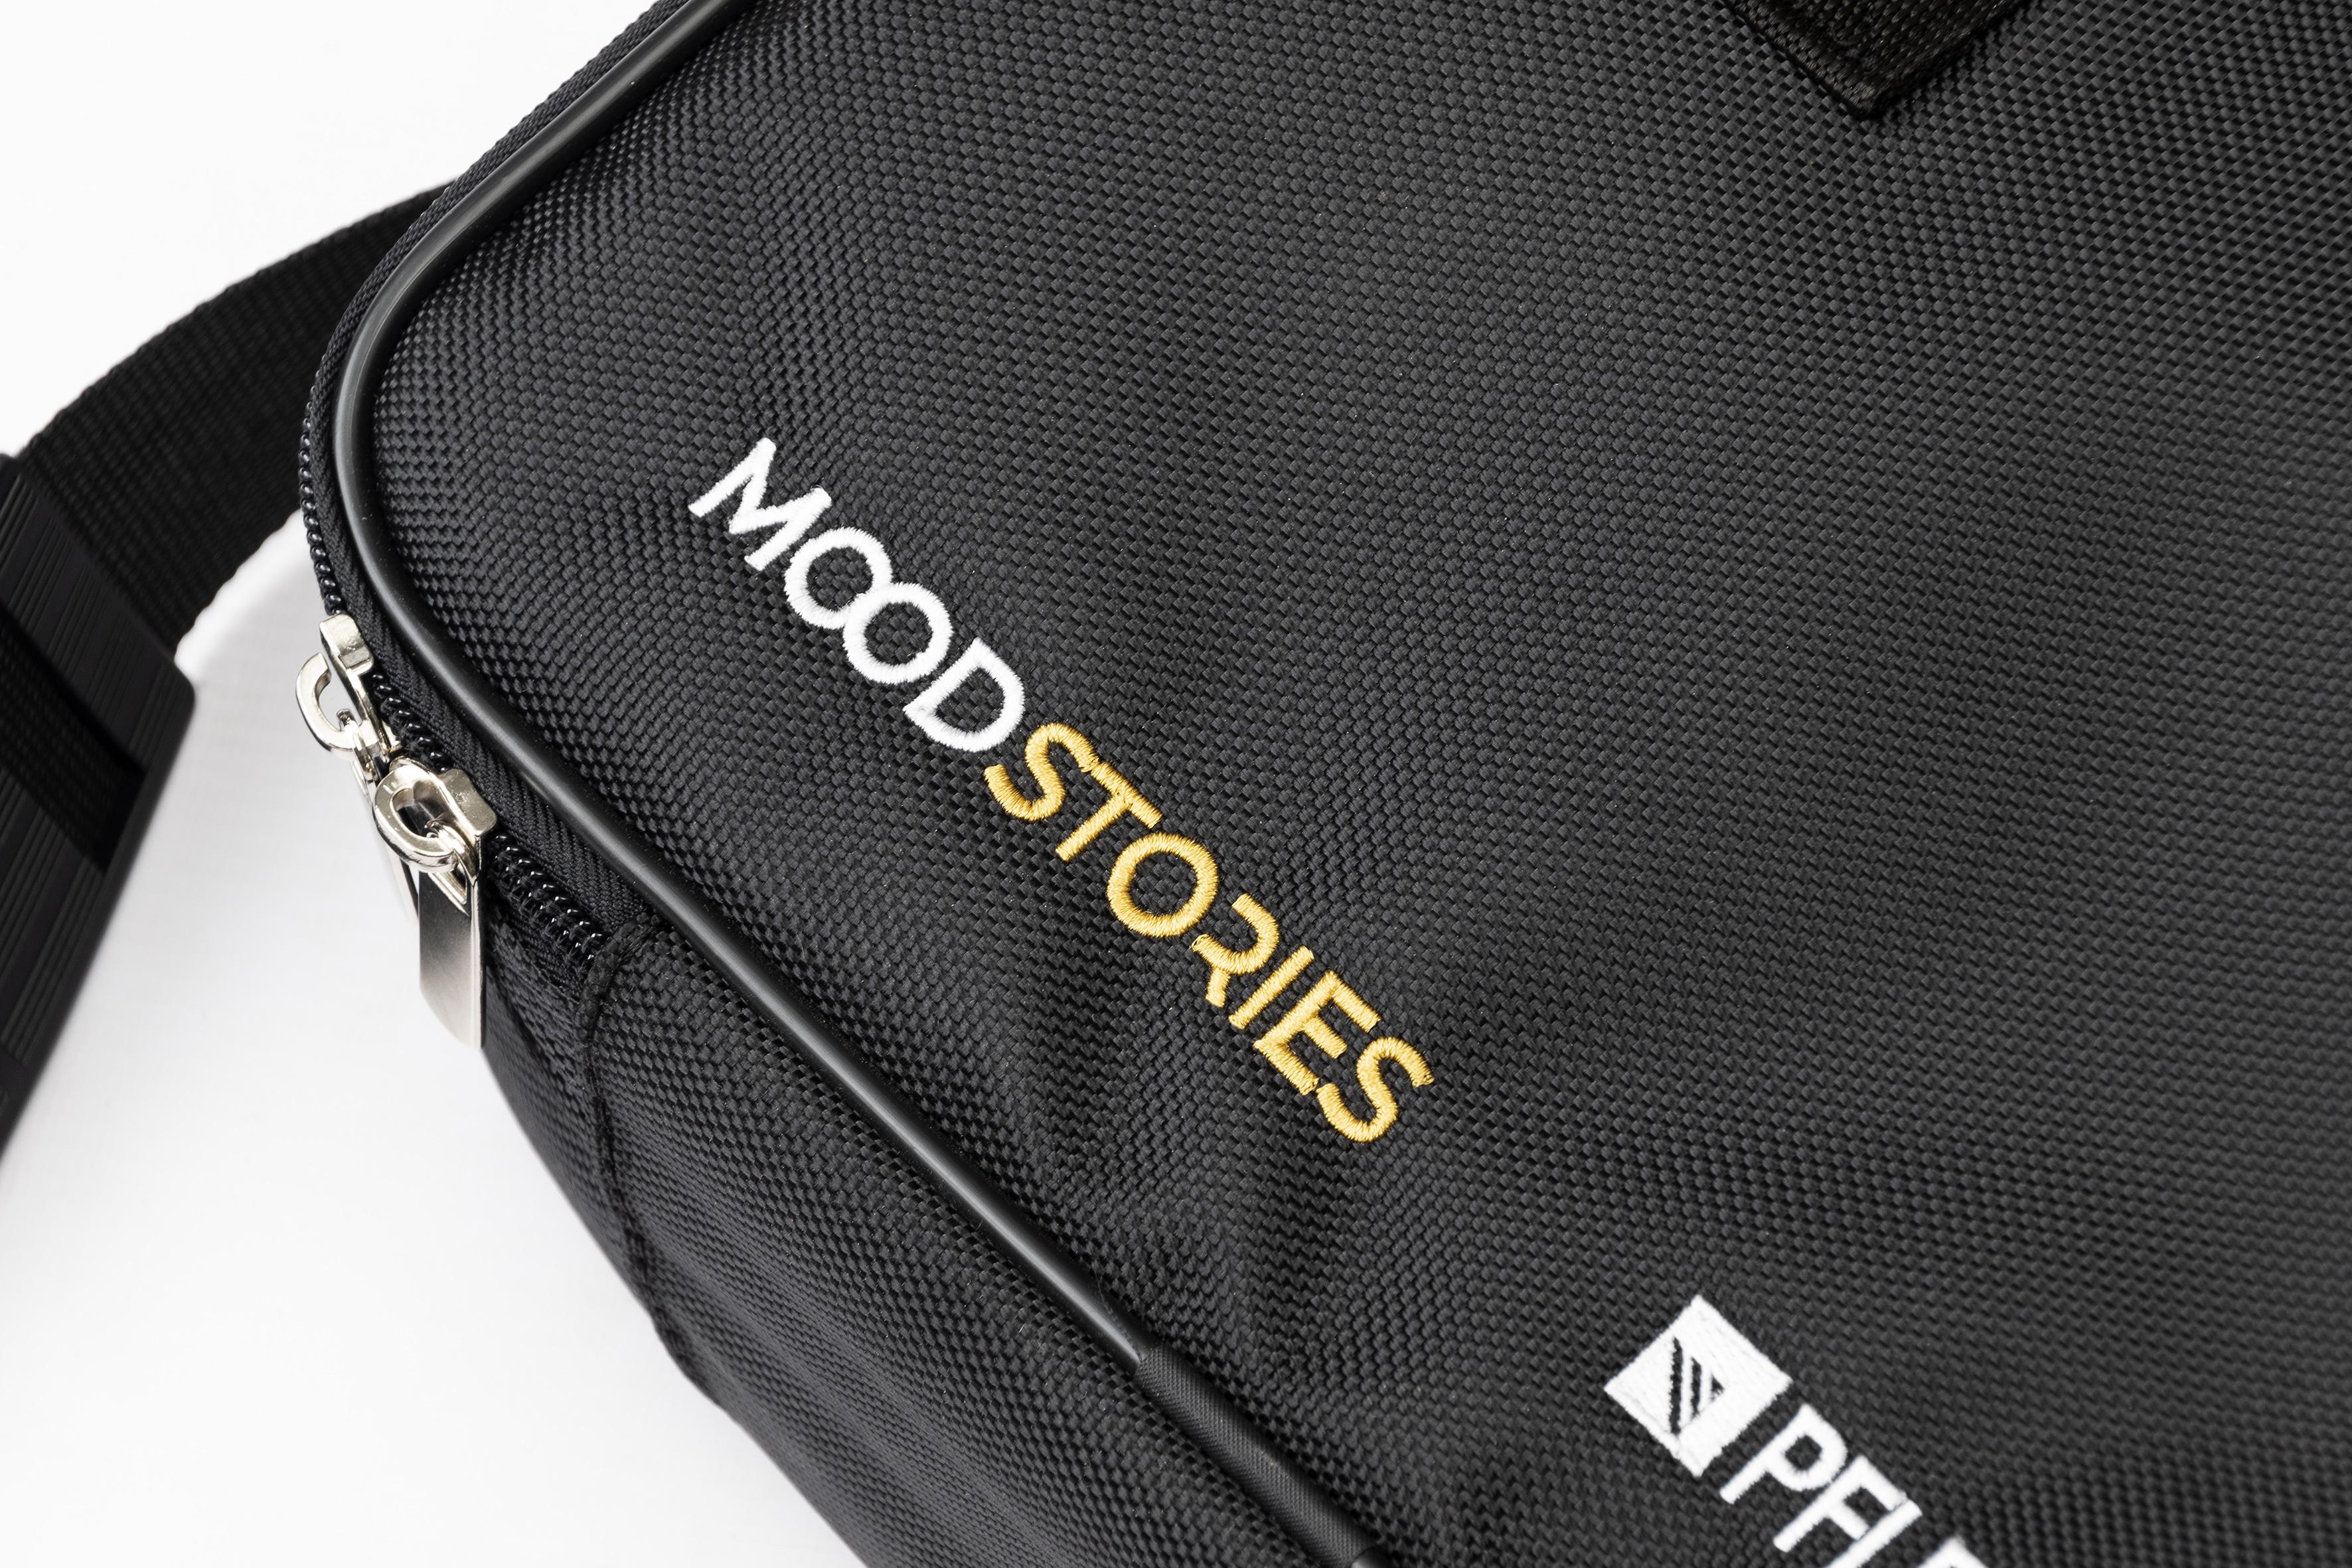 Torba na wzorniki listkowe kolekcji Mood Stories Comfort Collection